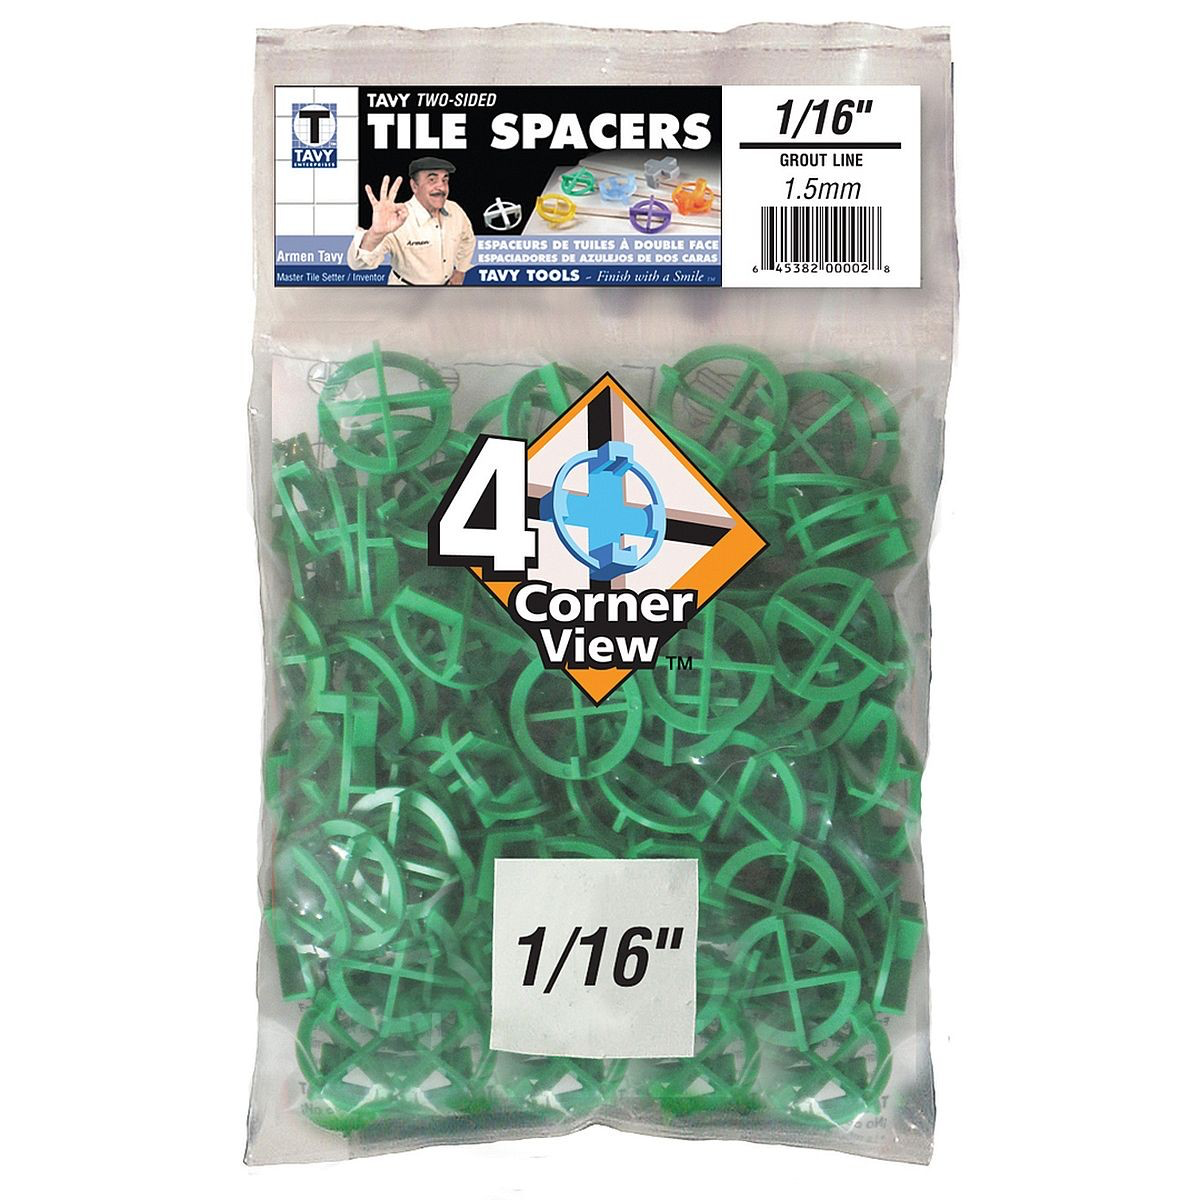 Tavy 1 16 Green Tile Spacers 100 Bag Green Tile Tile Spacers Tiles